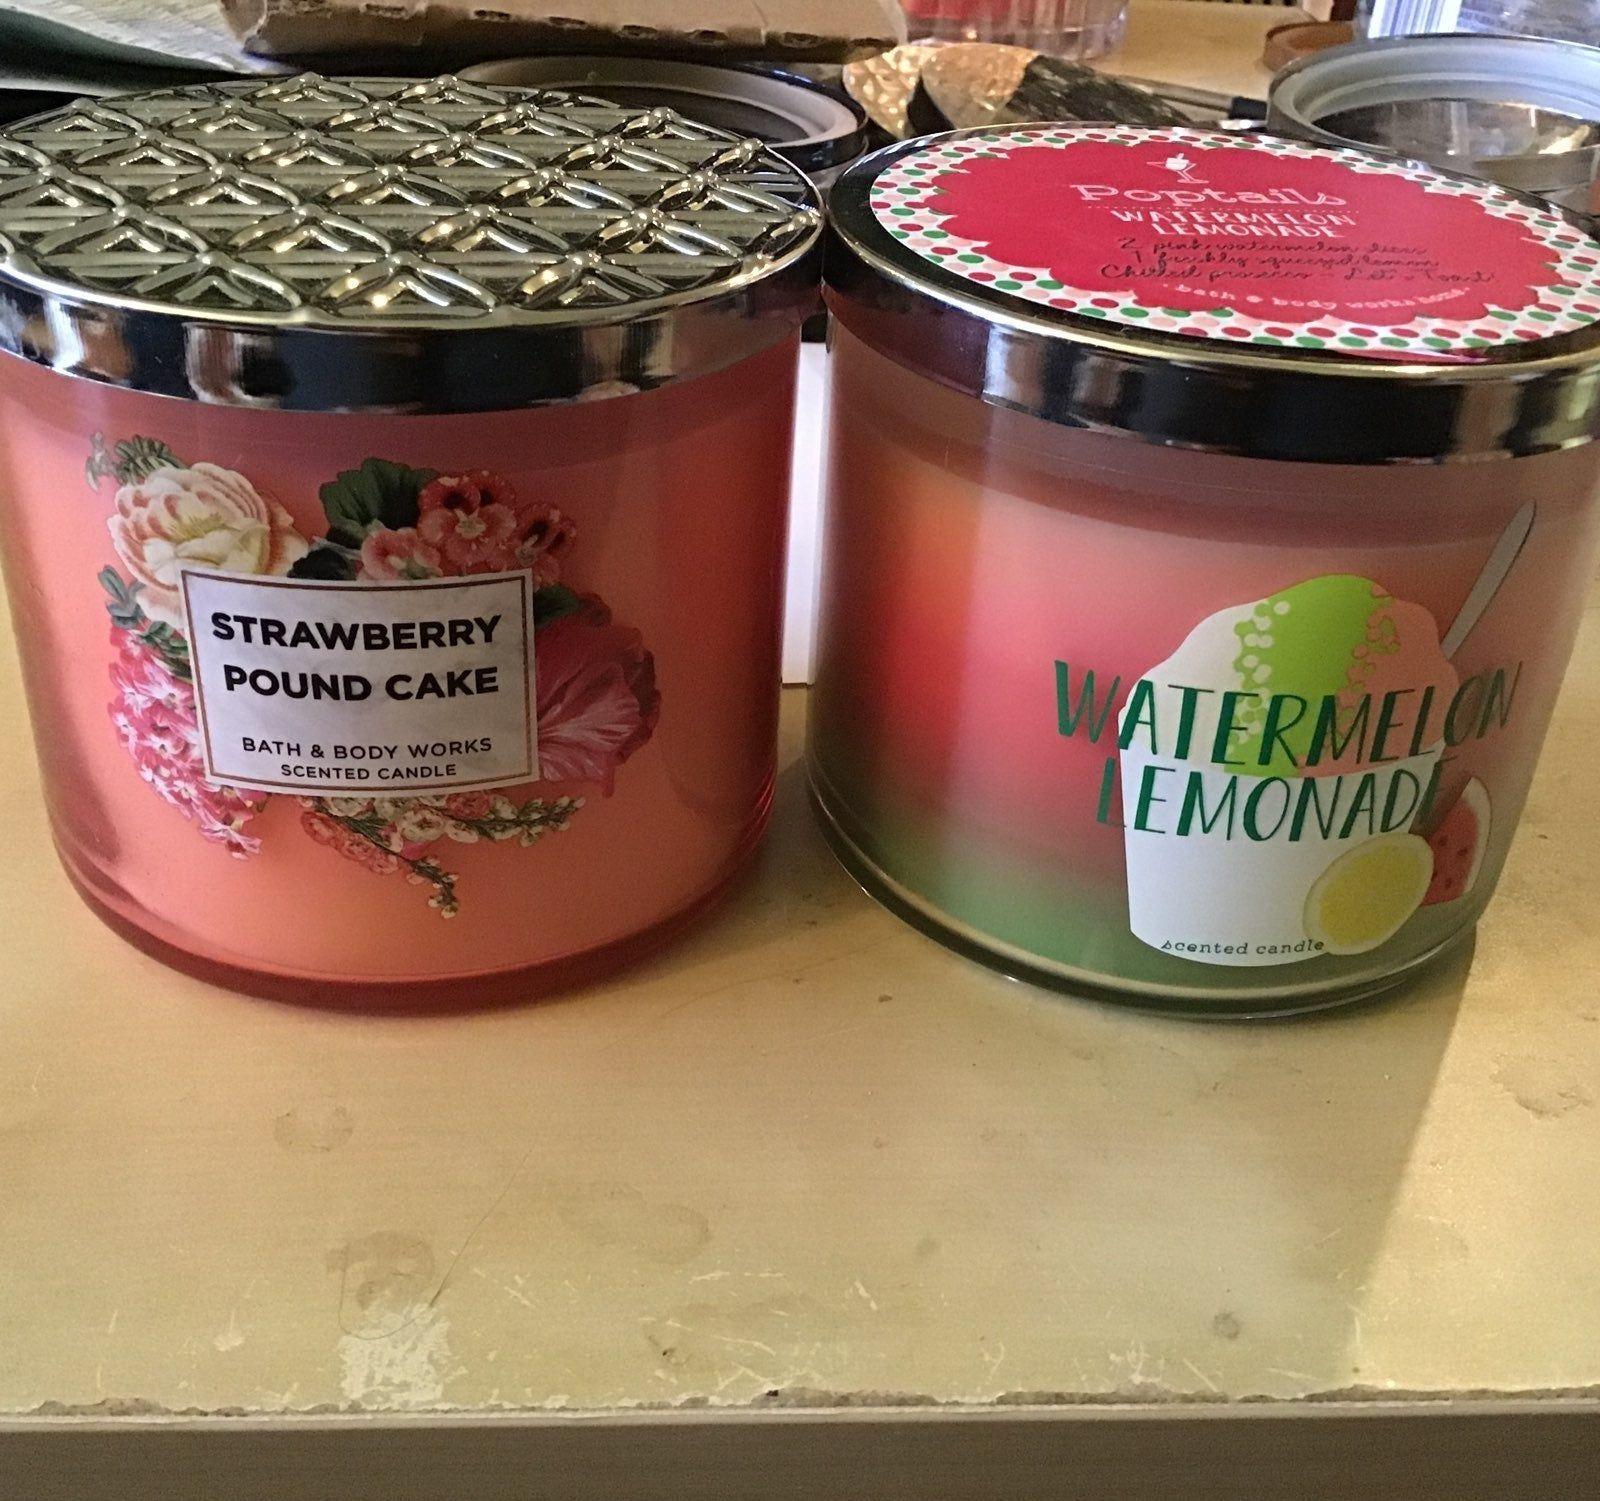 Brand new original strawberry poundcake with dark jar